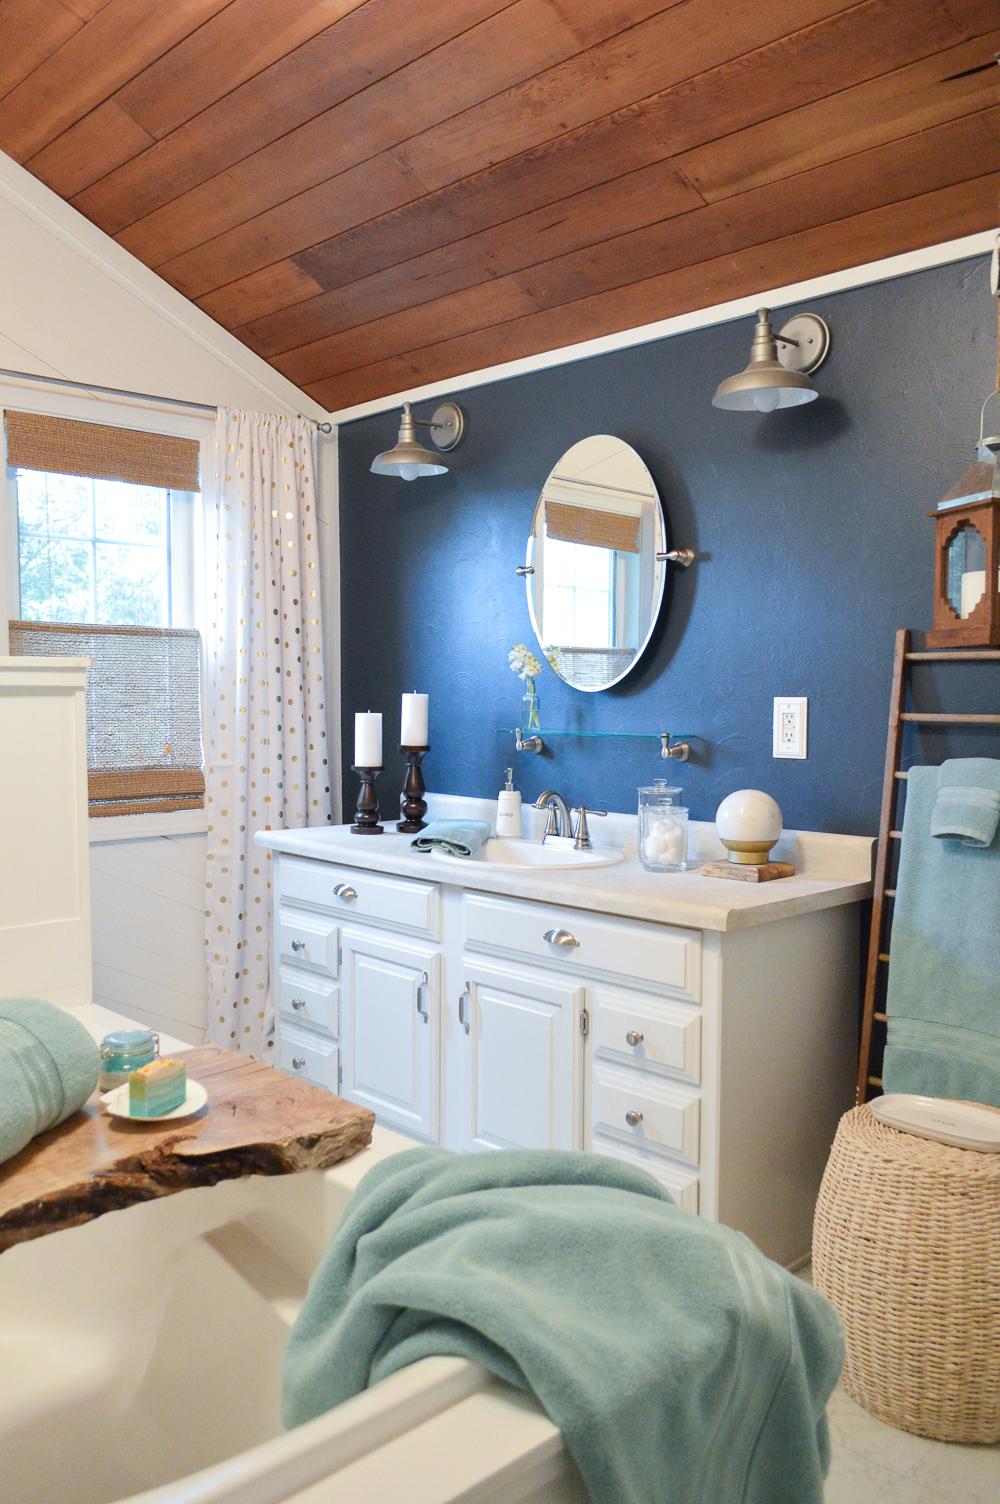 Aqua Summer Bathroom Refresh | Better Homes & Gardens thick and plush bath collection, in aquifer. #ad